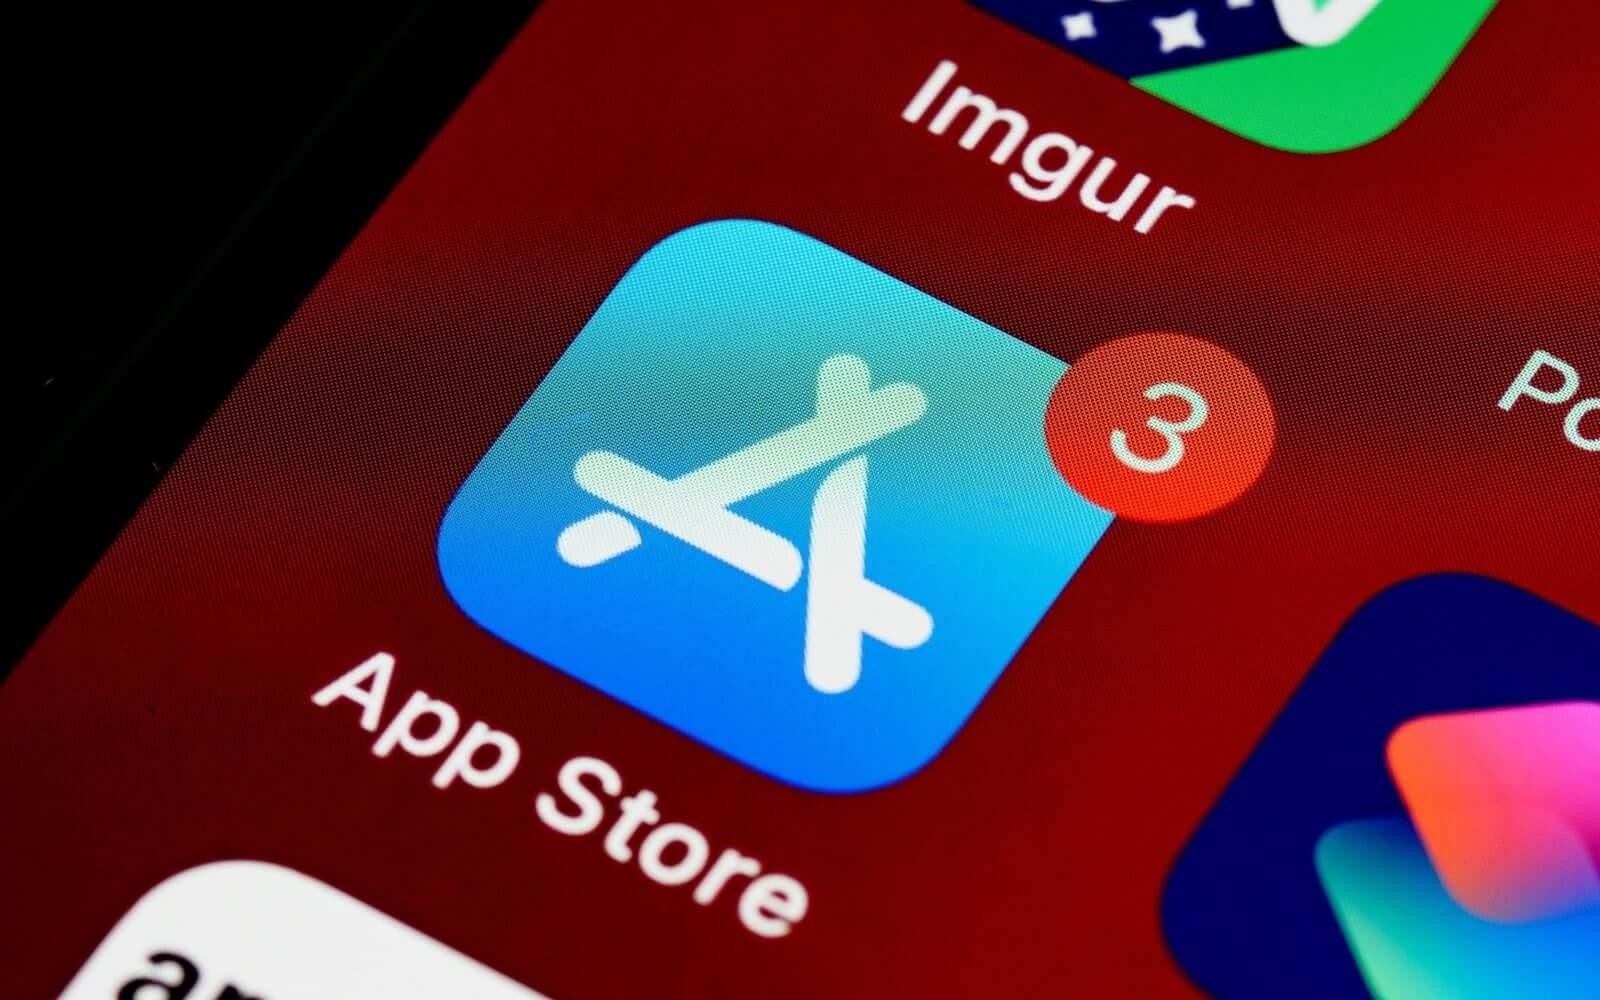 Малварь XcodeGhost заразила 128 000 000 iOS-устройств